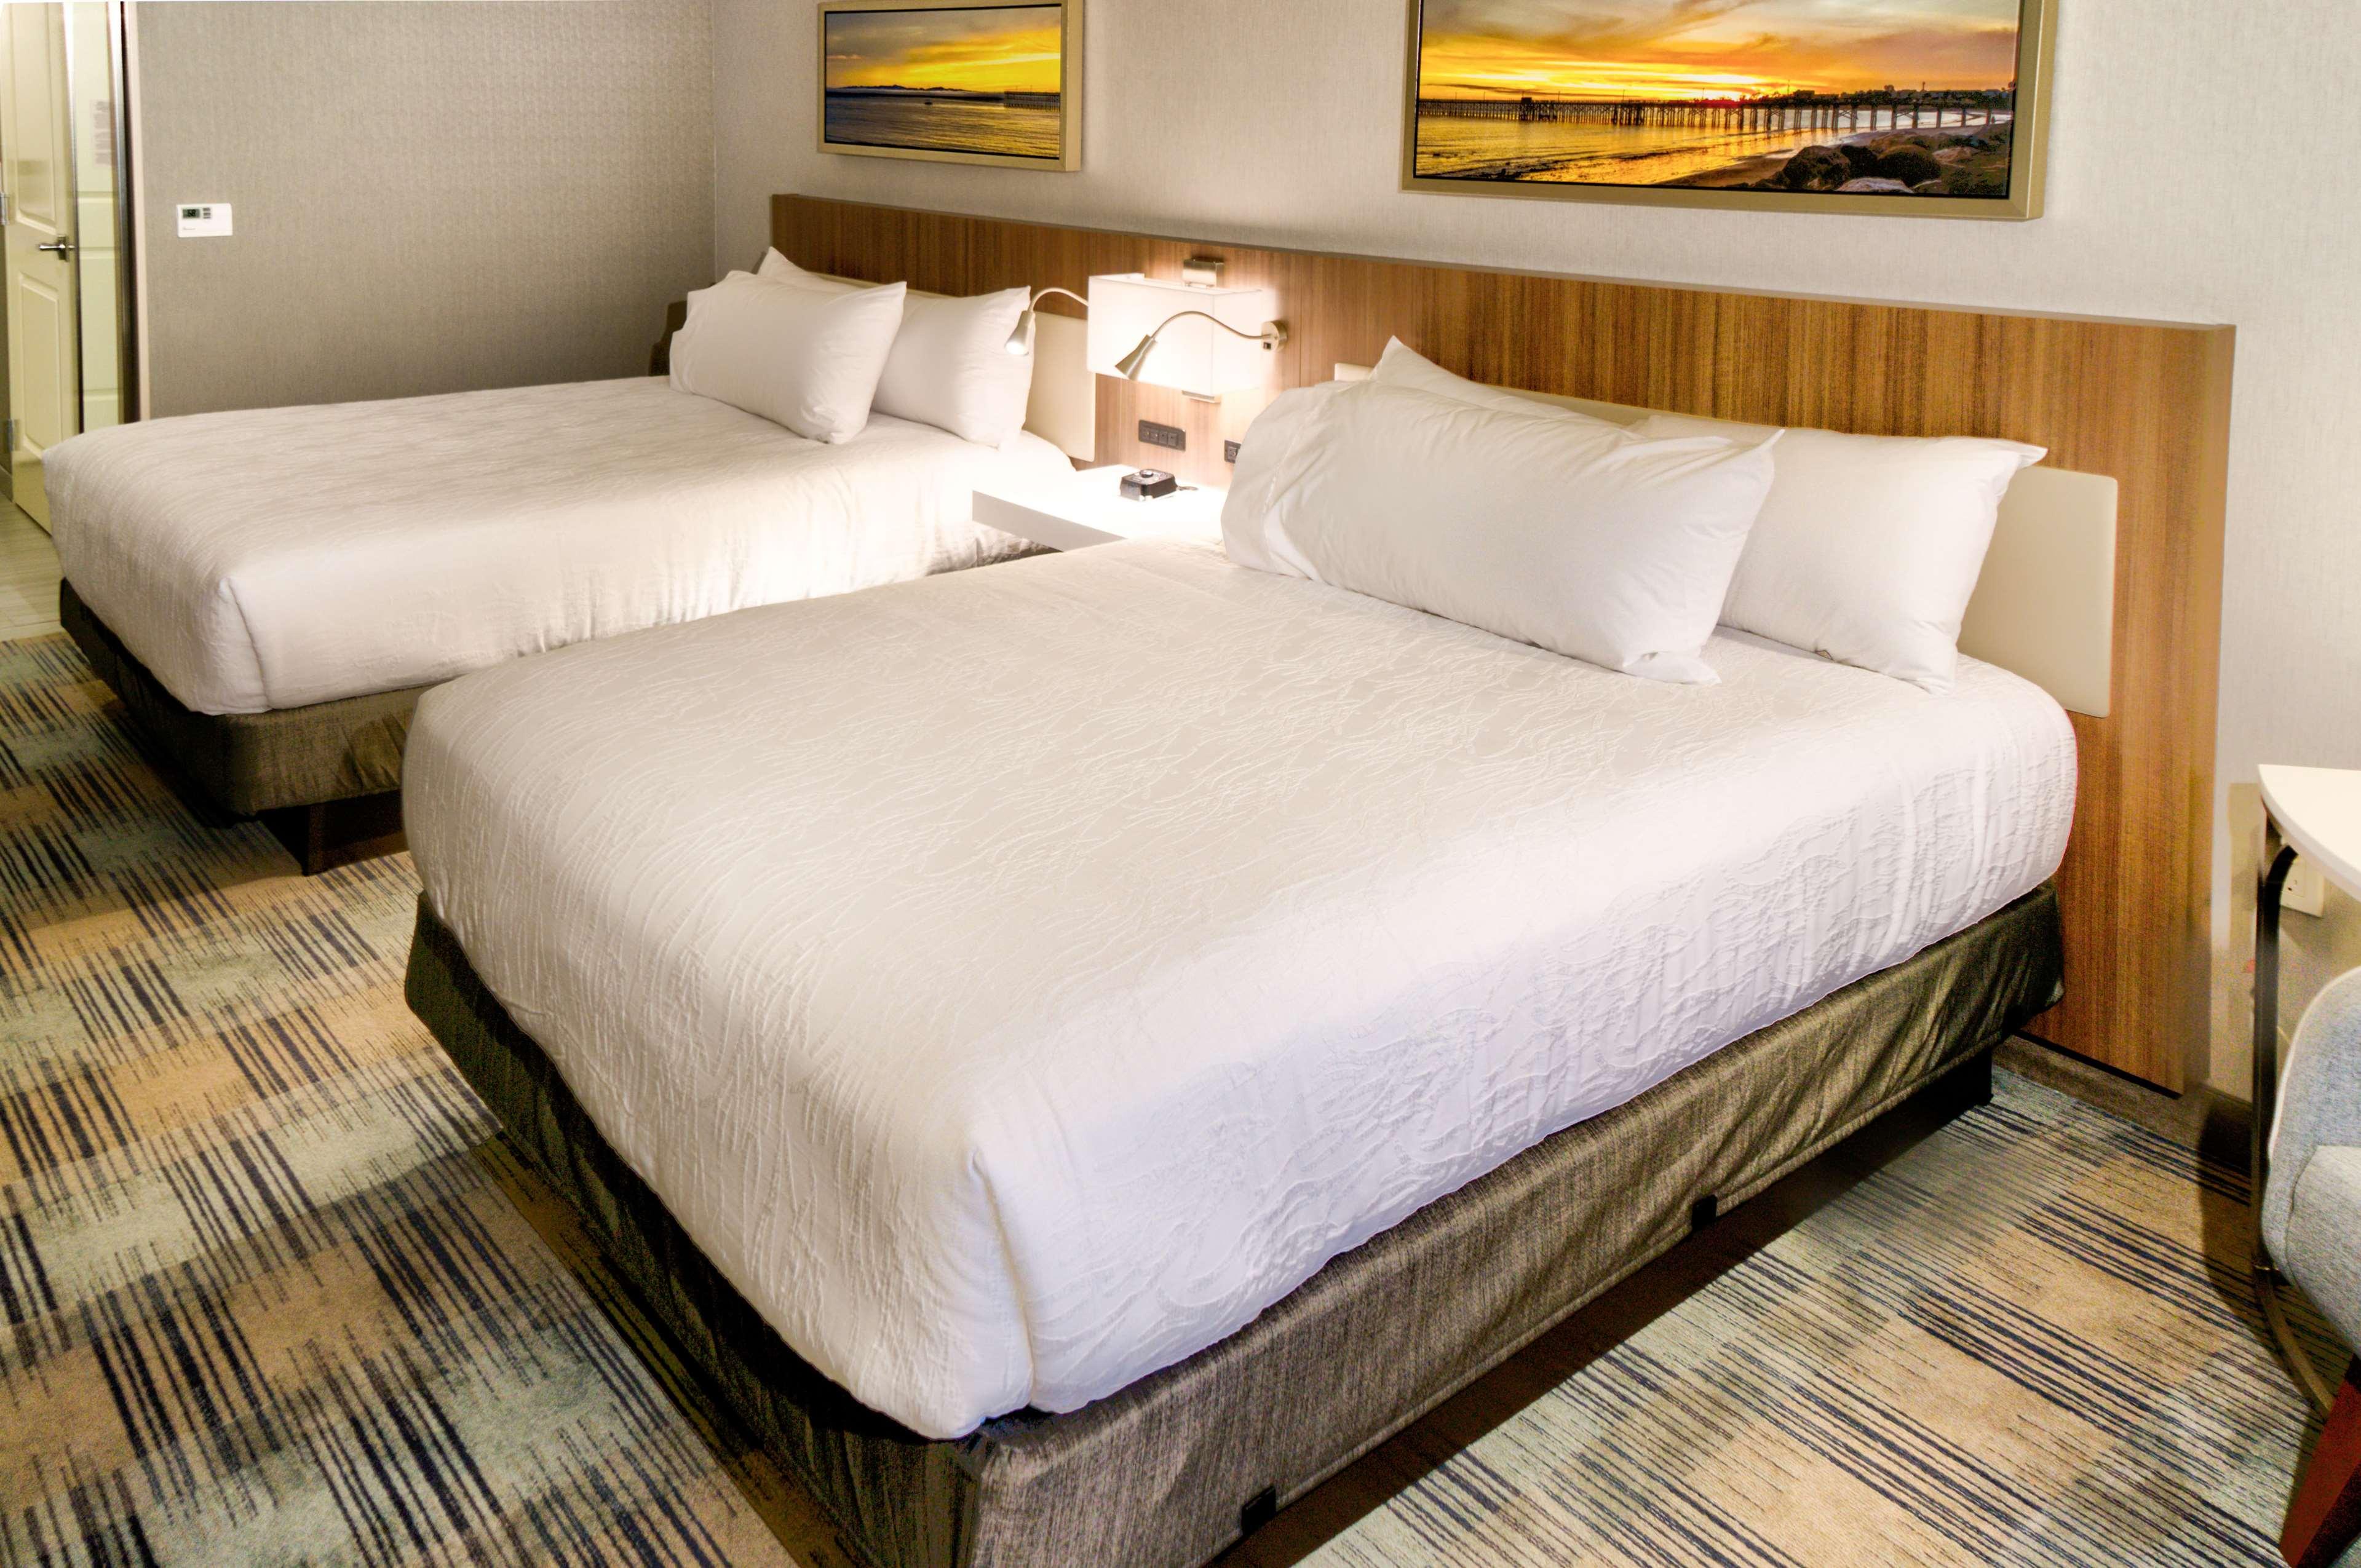 Hilton Garden Inn Santa Barbara/Goleta image 25